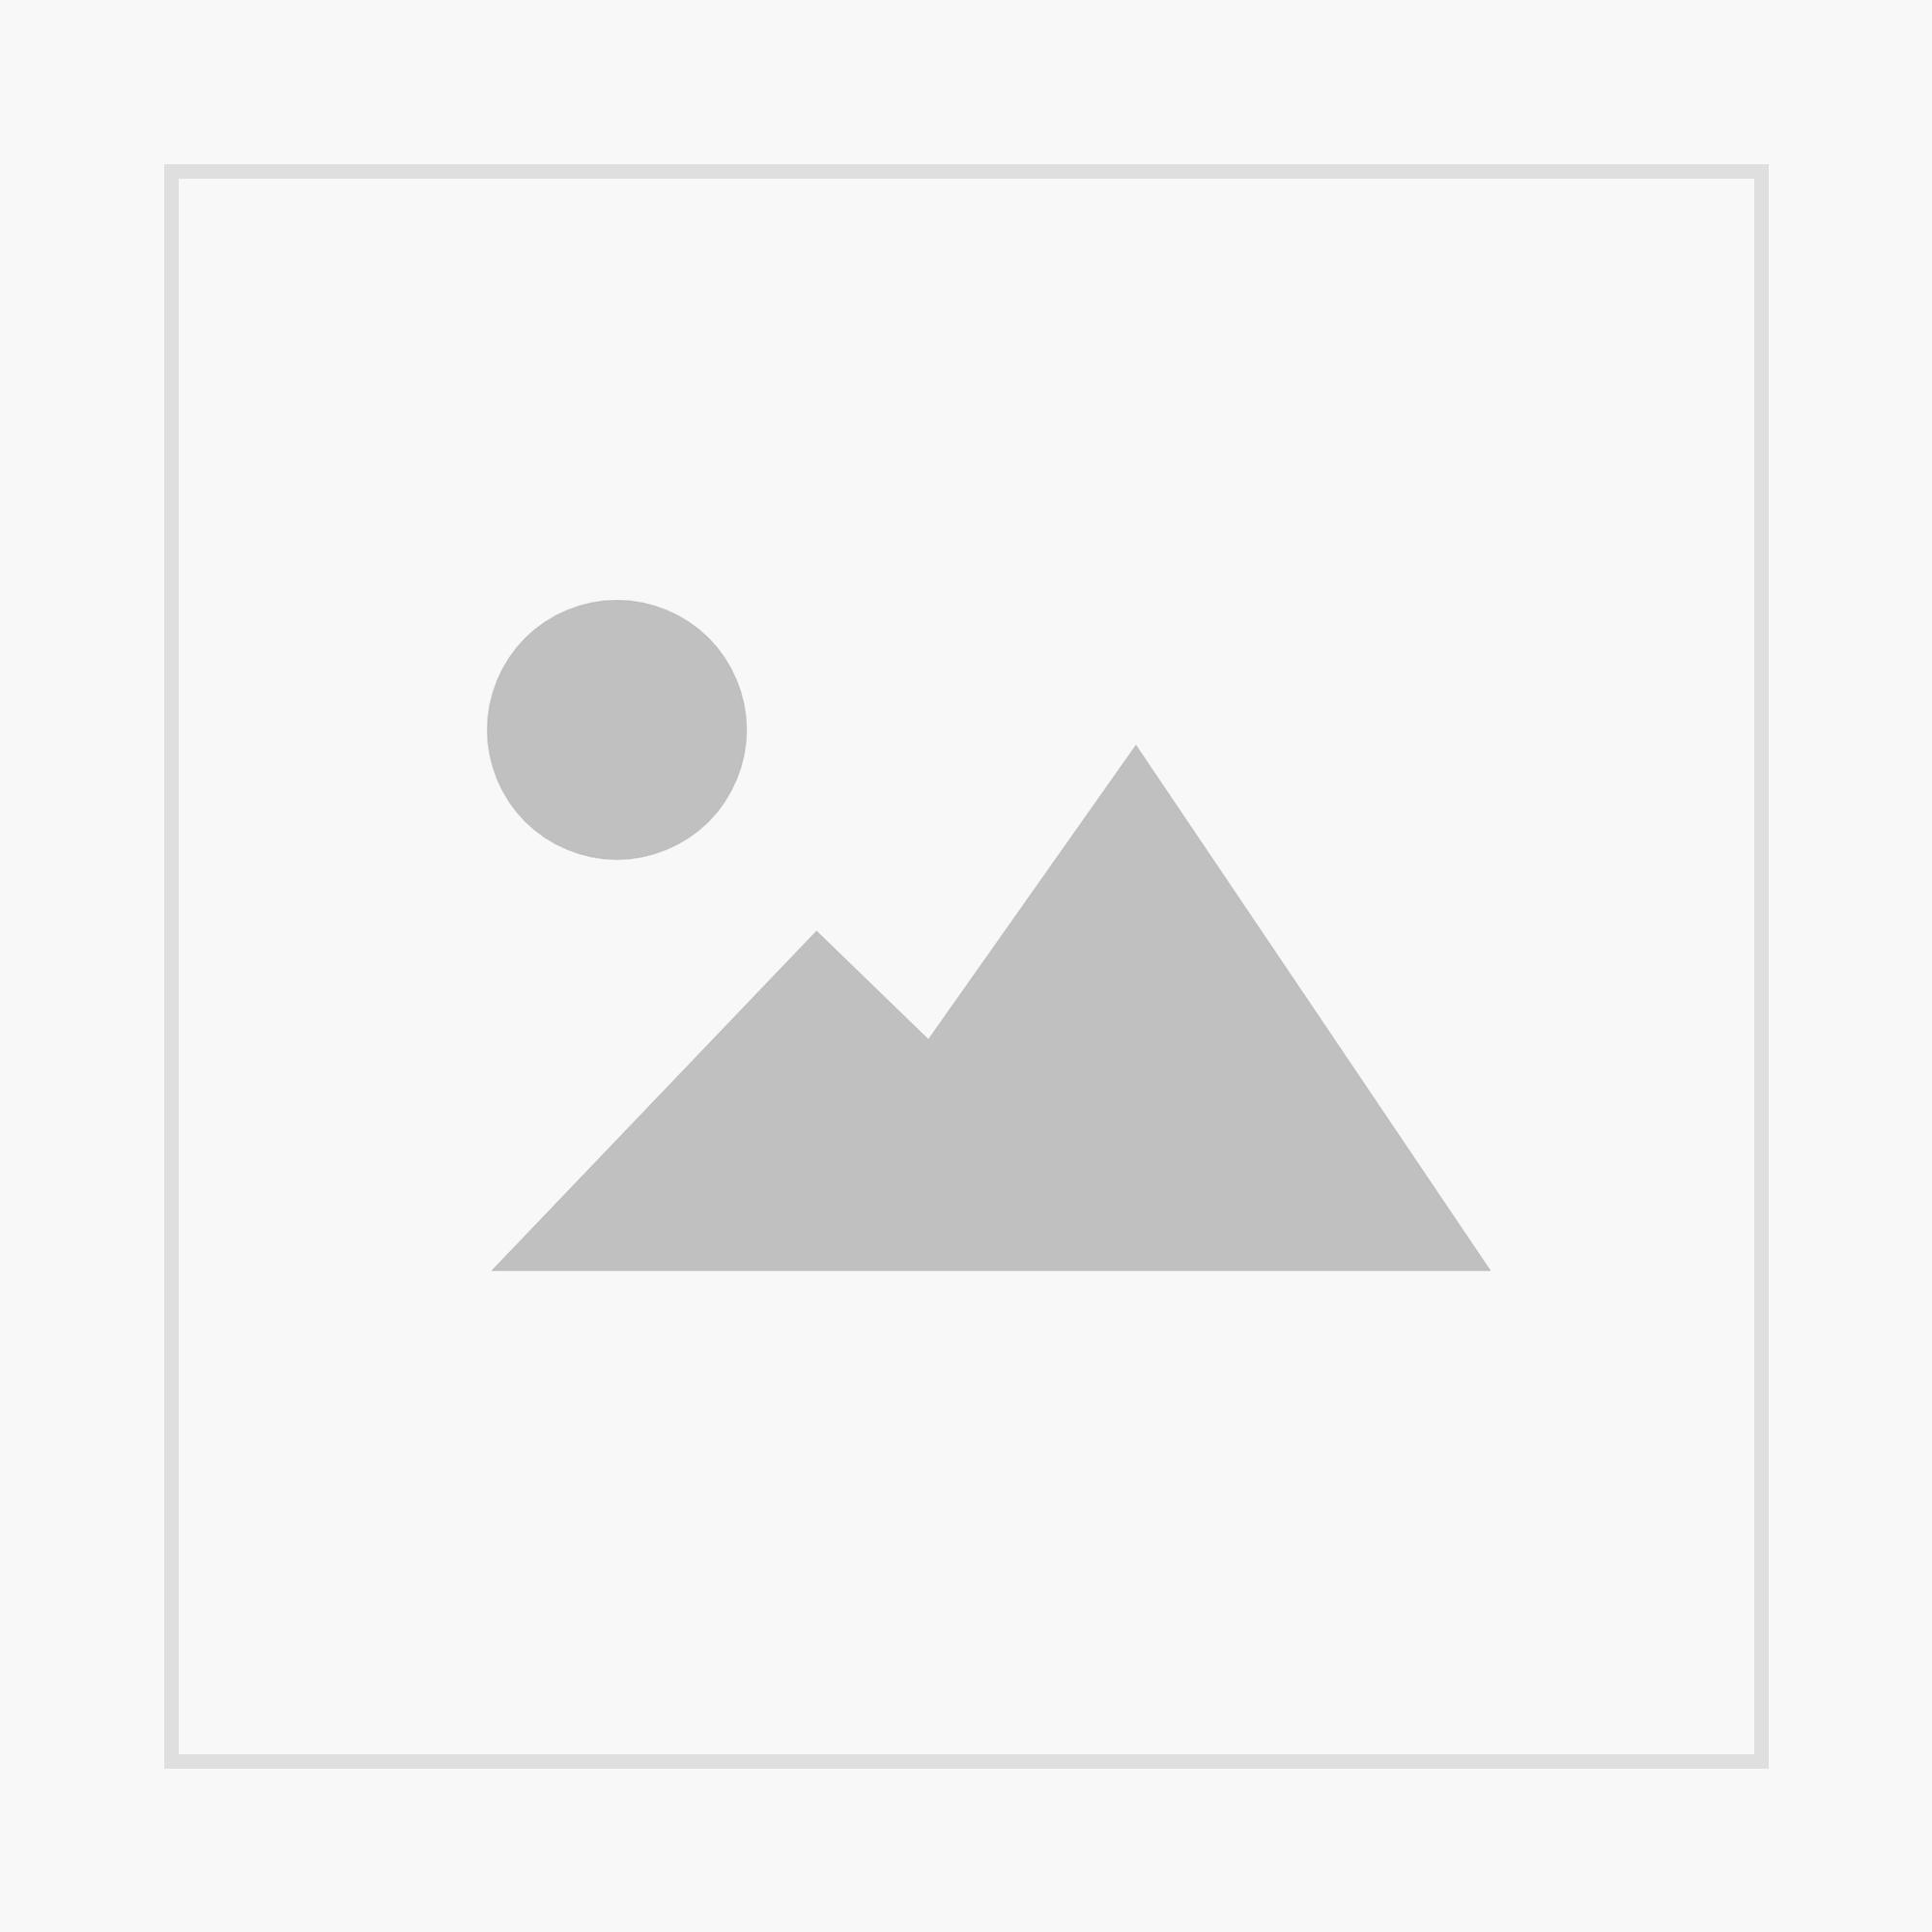 INGRID KLIMKE 1/2018 – Motivation